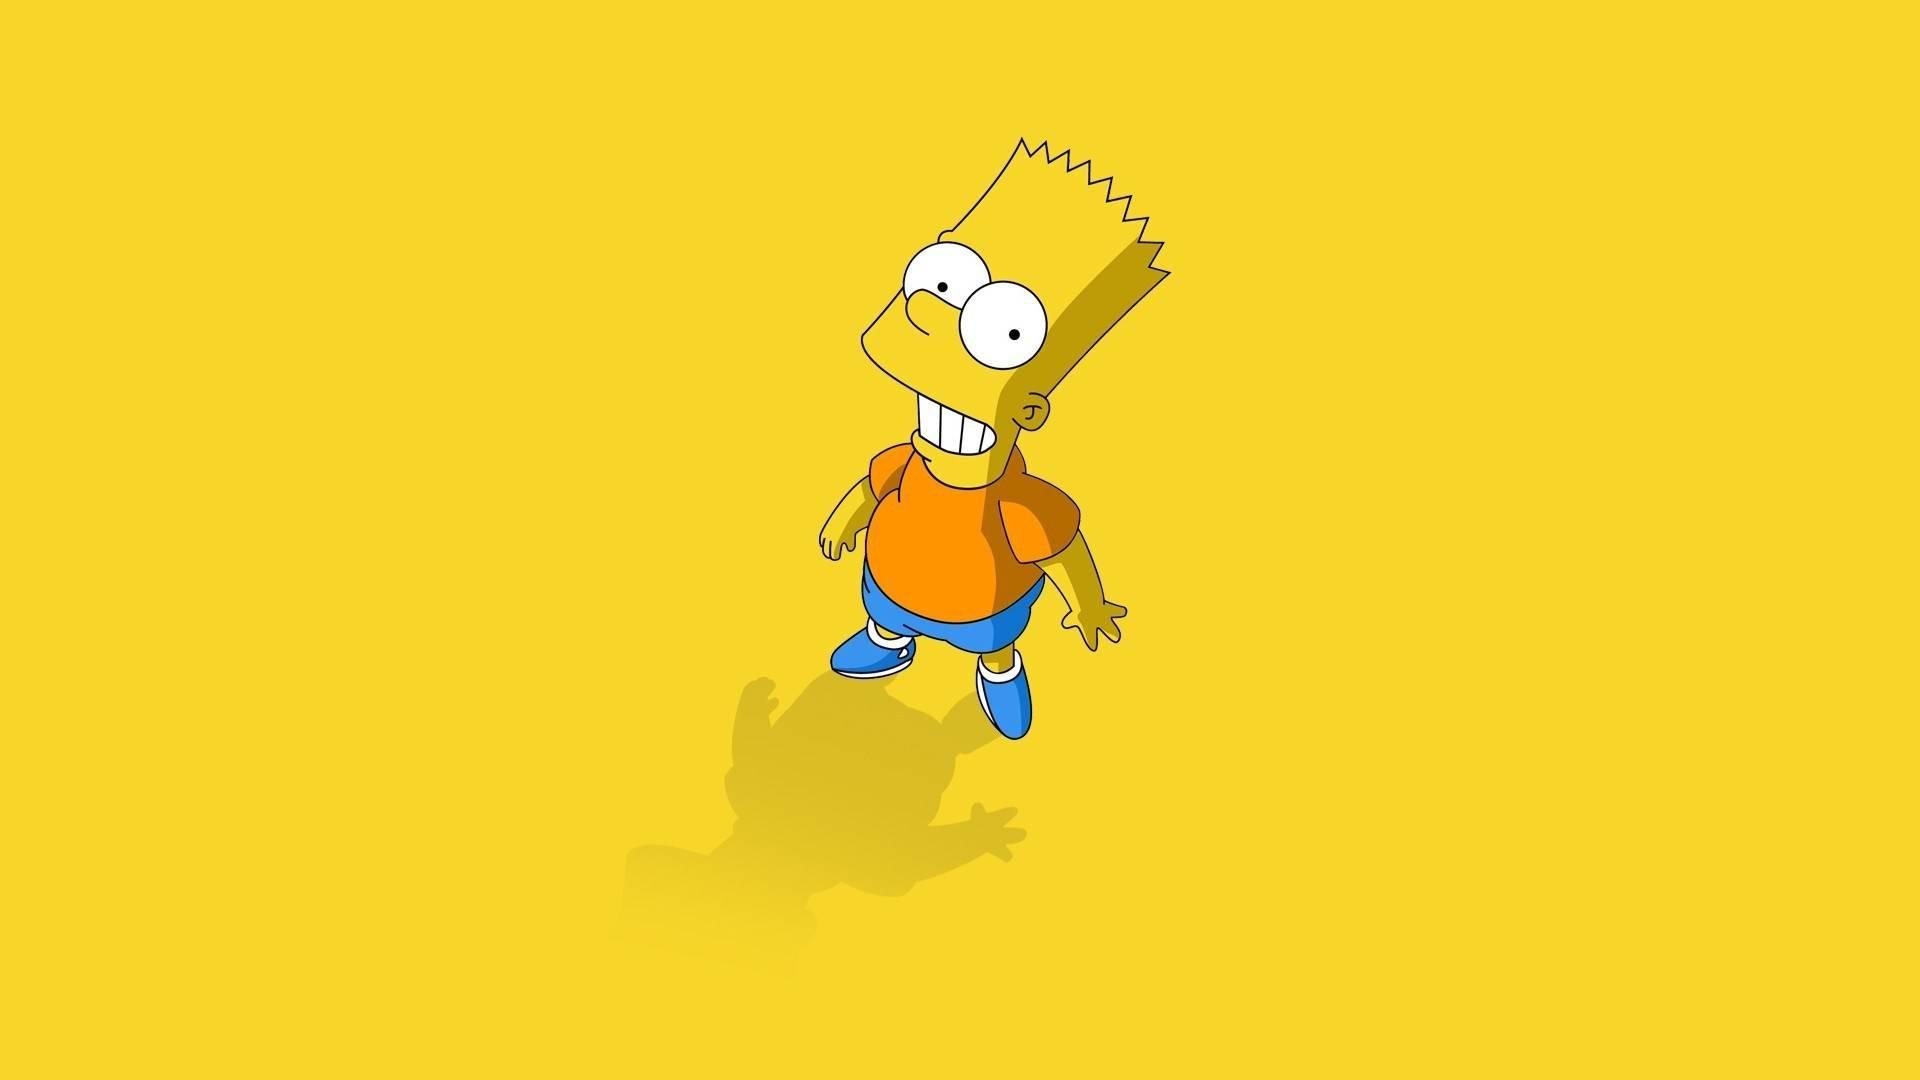 Bart Wallpaper   The Simpsons Wallpaper 1920x1080